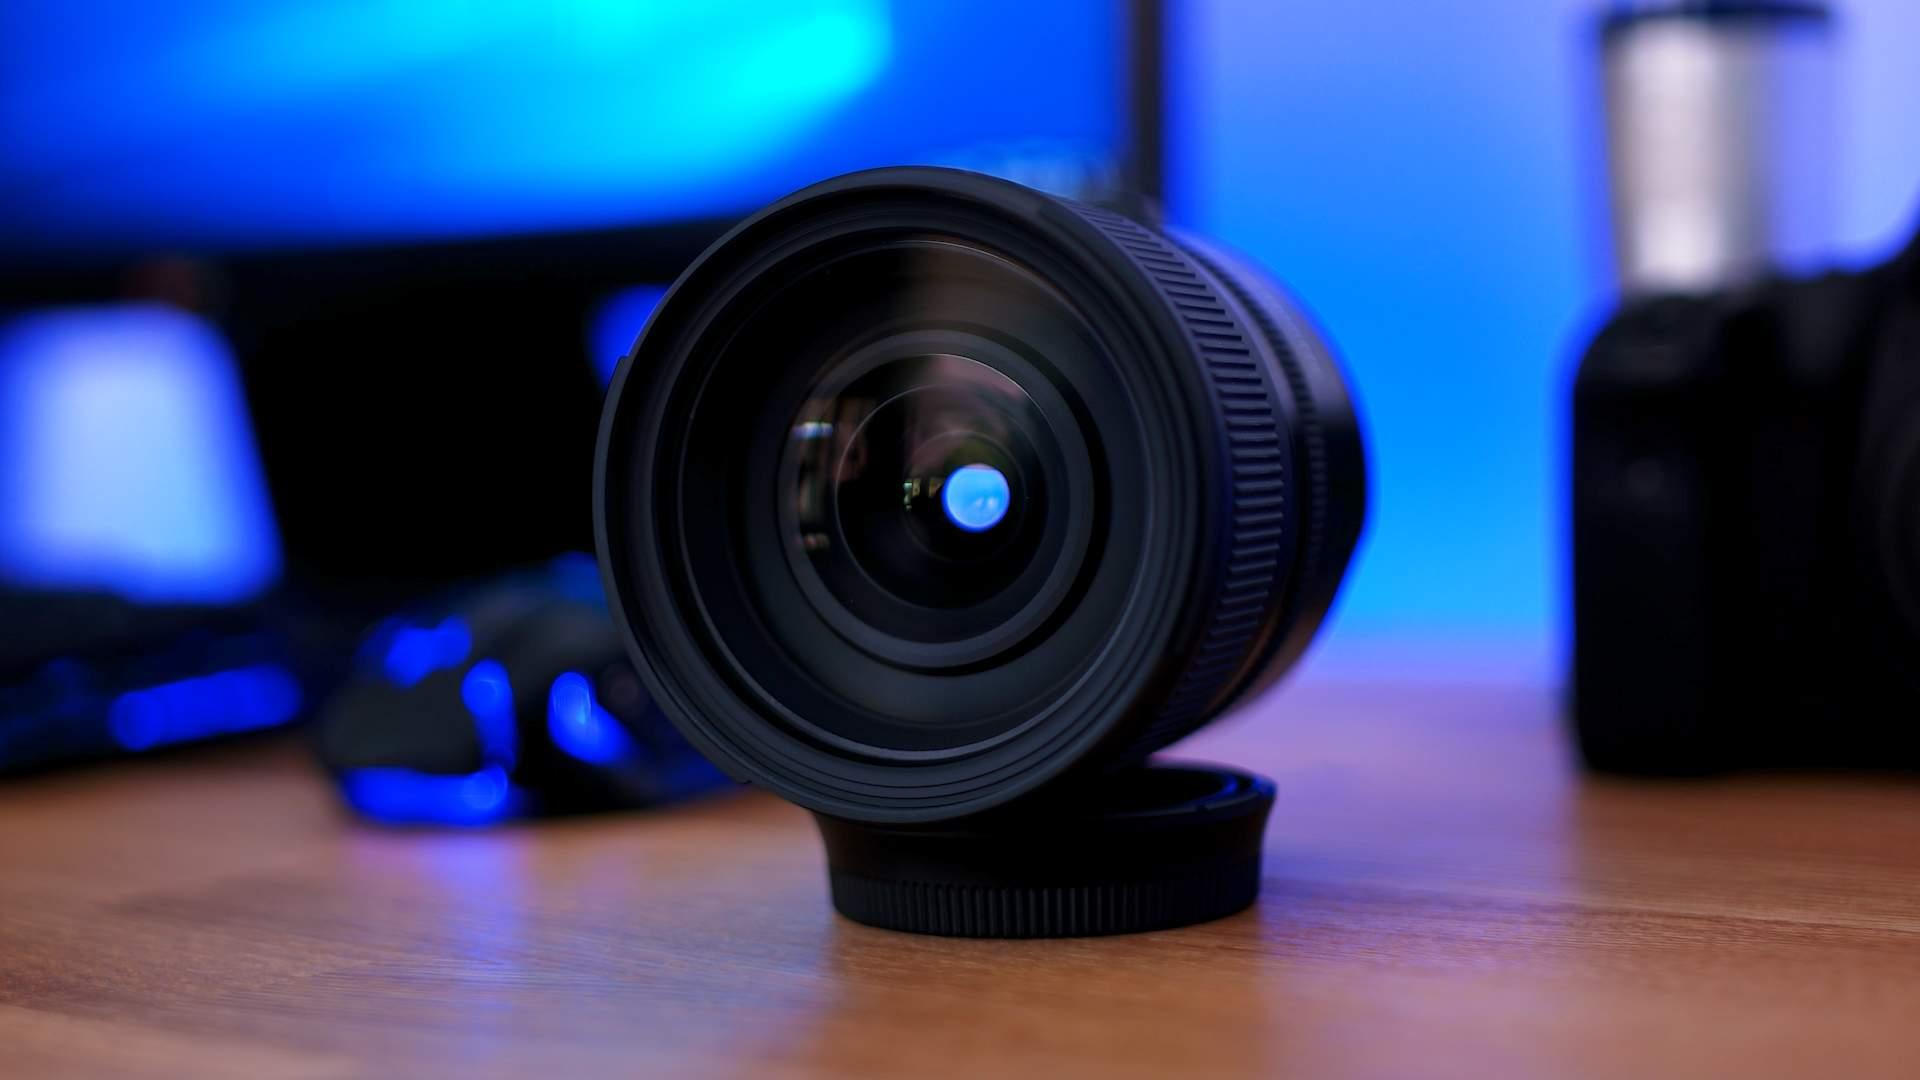 Vista frontale Tamron 24-70mm f2.8 G2